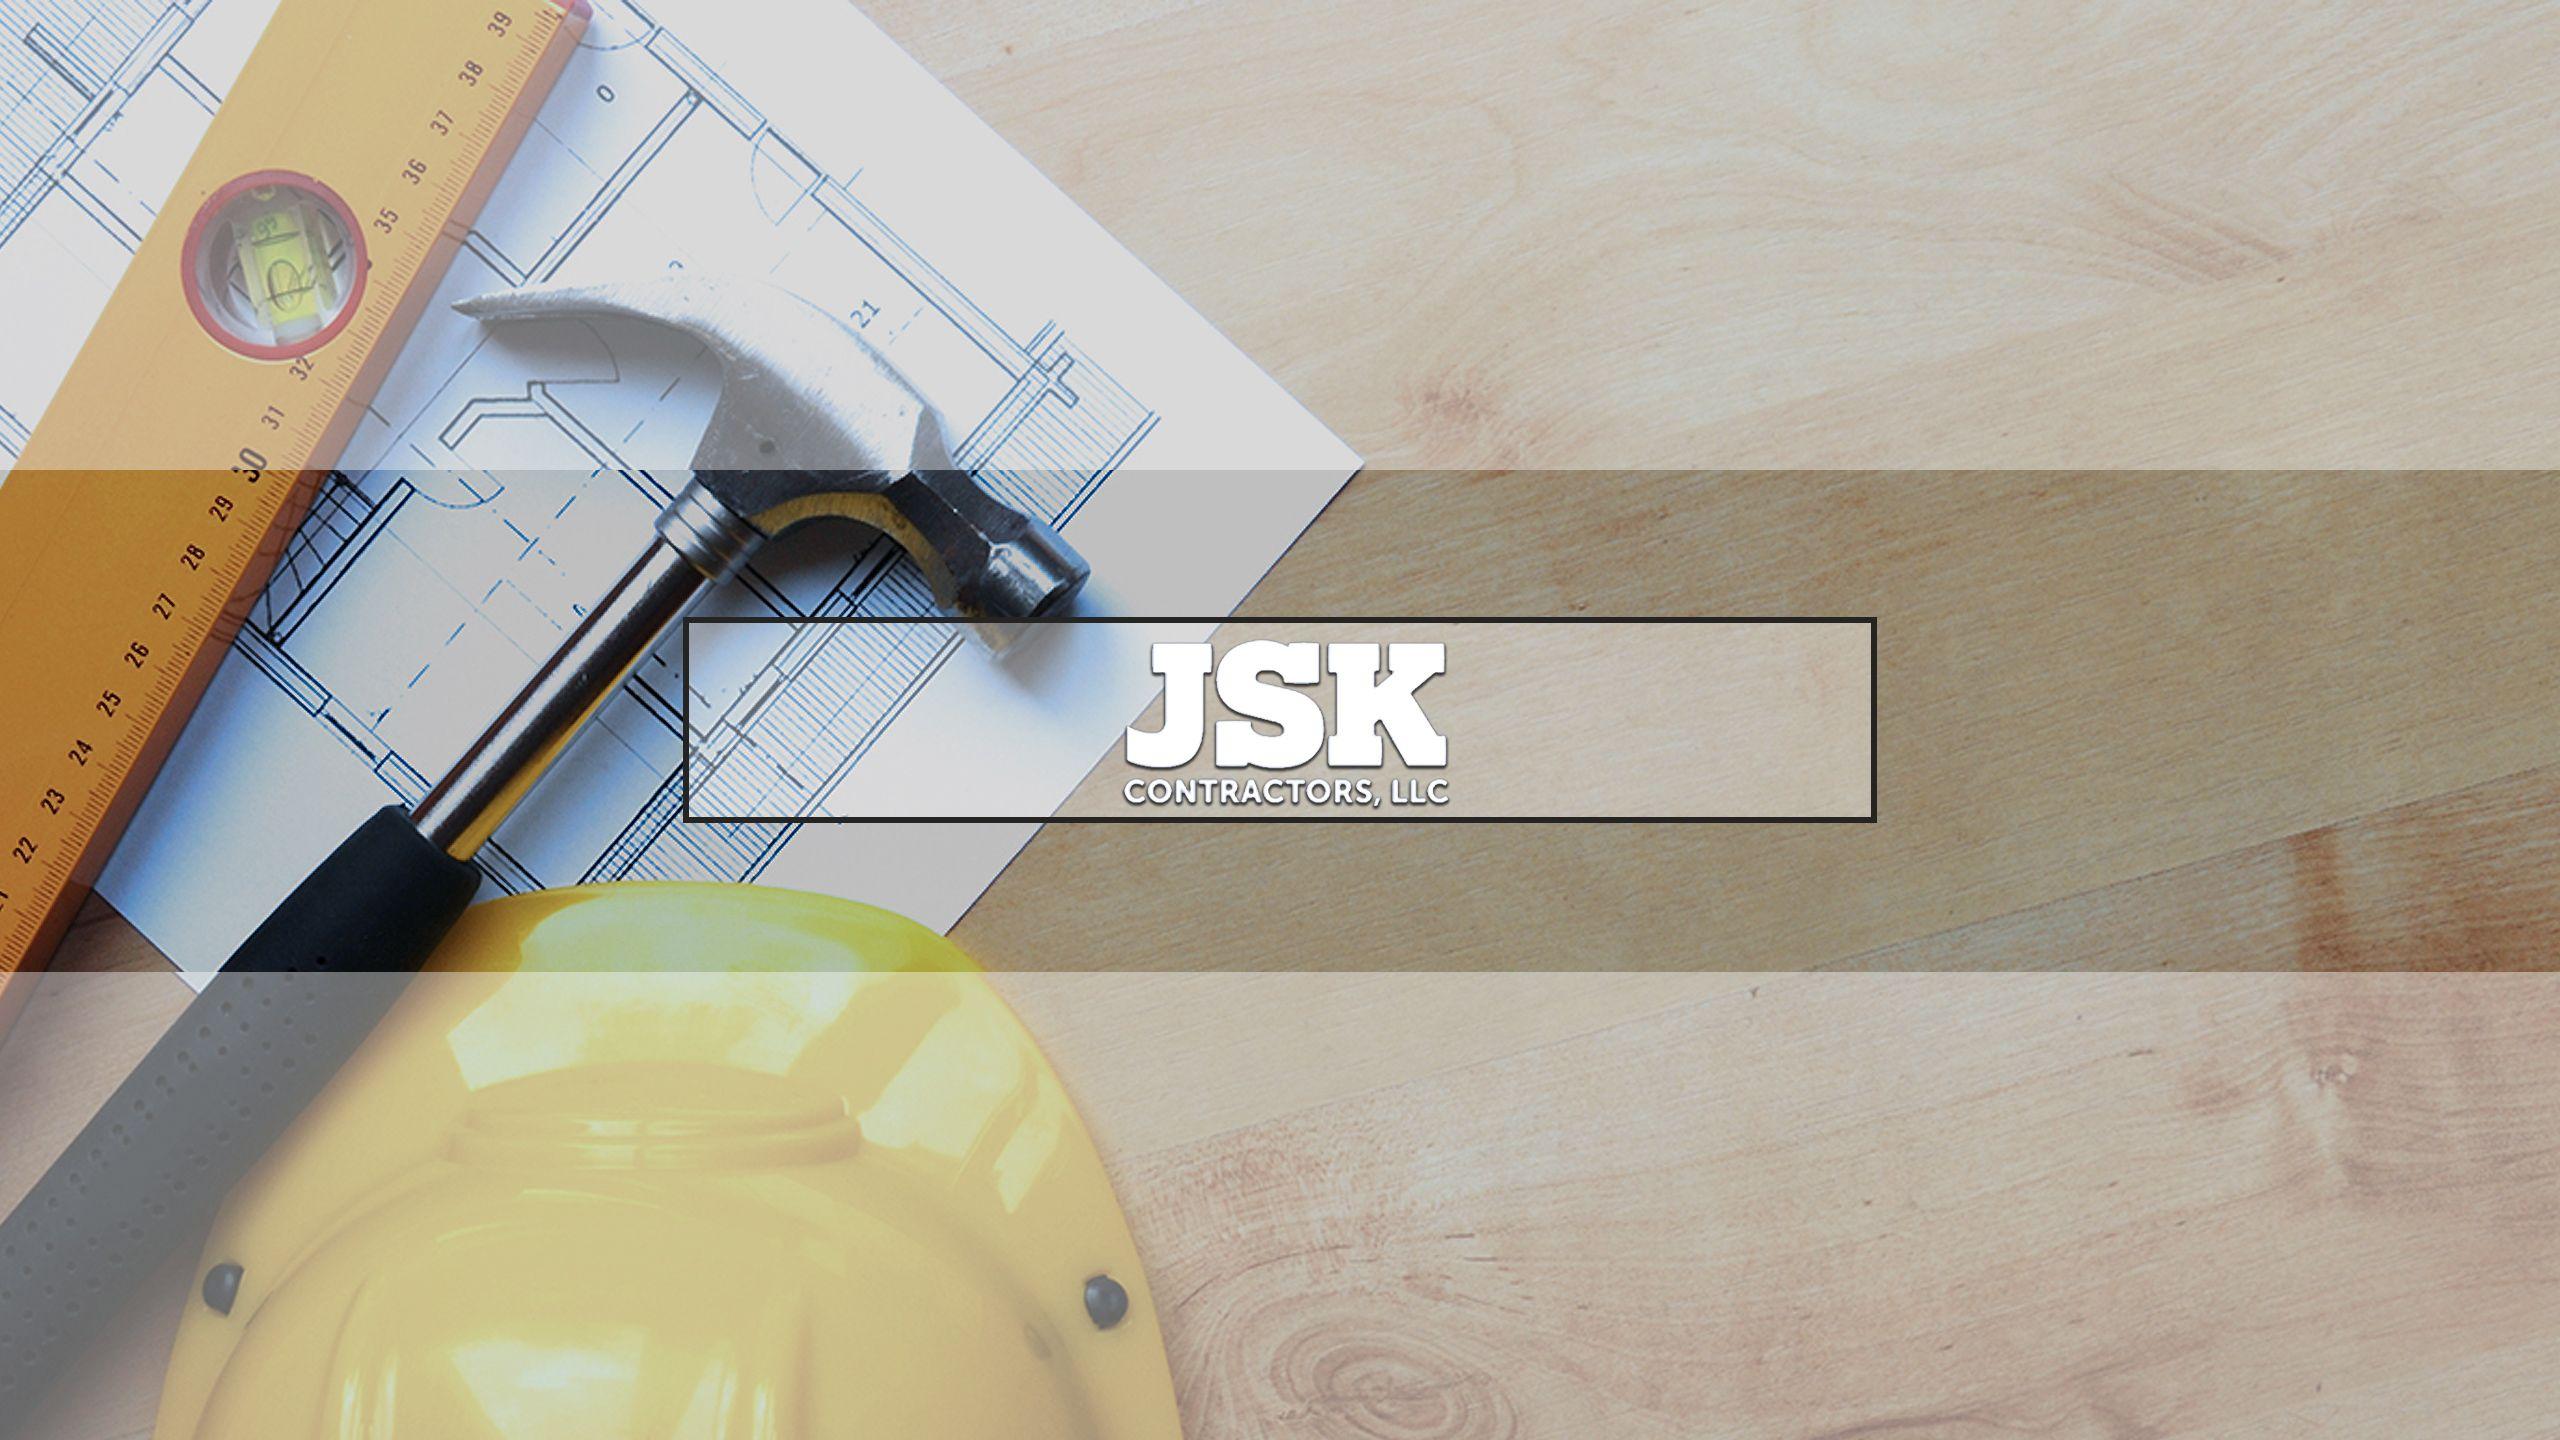 Jsk Contractors Llc Is A Home Improvement Company In Bridgeport Ct We Offer Renovations Kitchen Remodel Bathroom And Plumbing